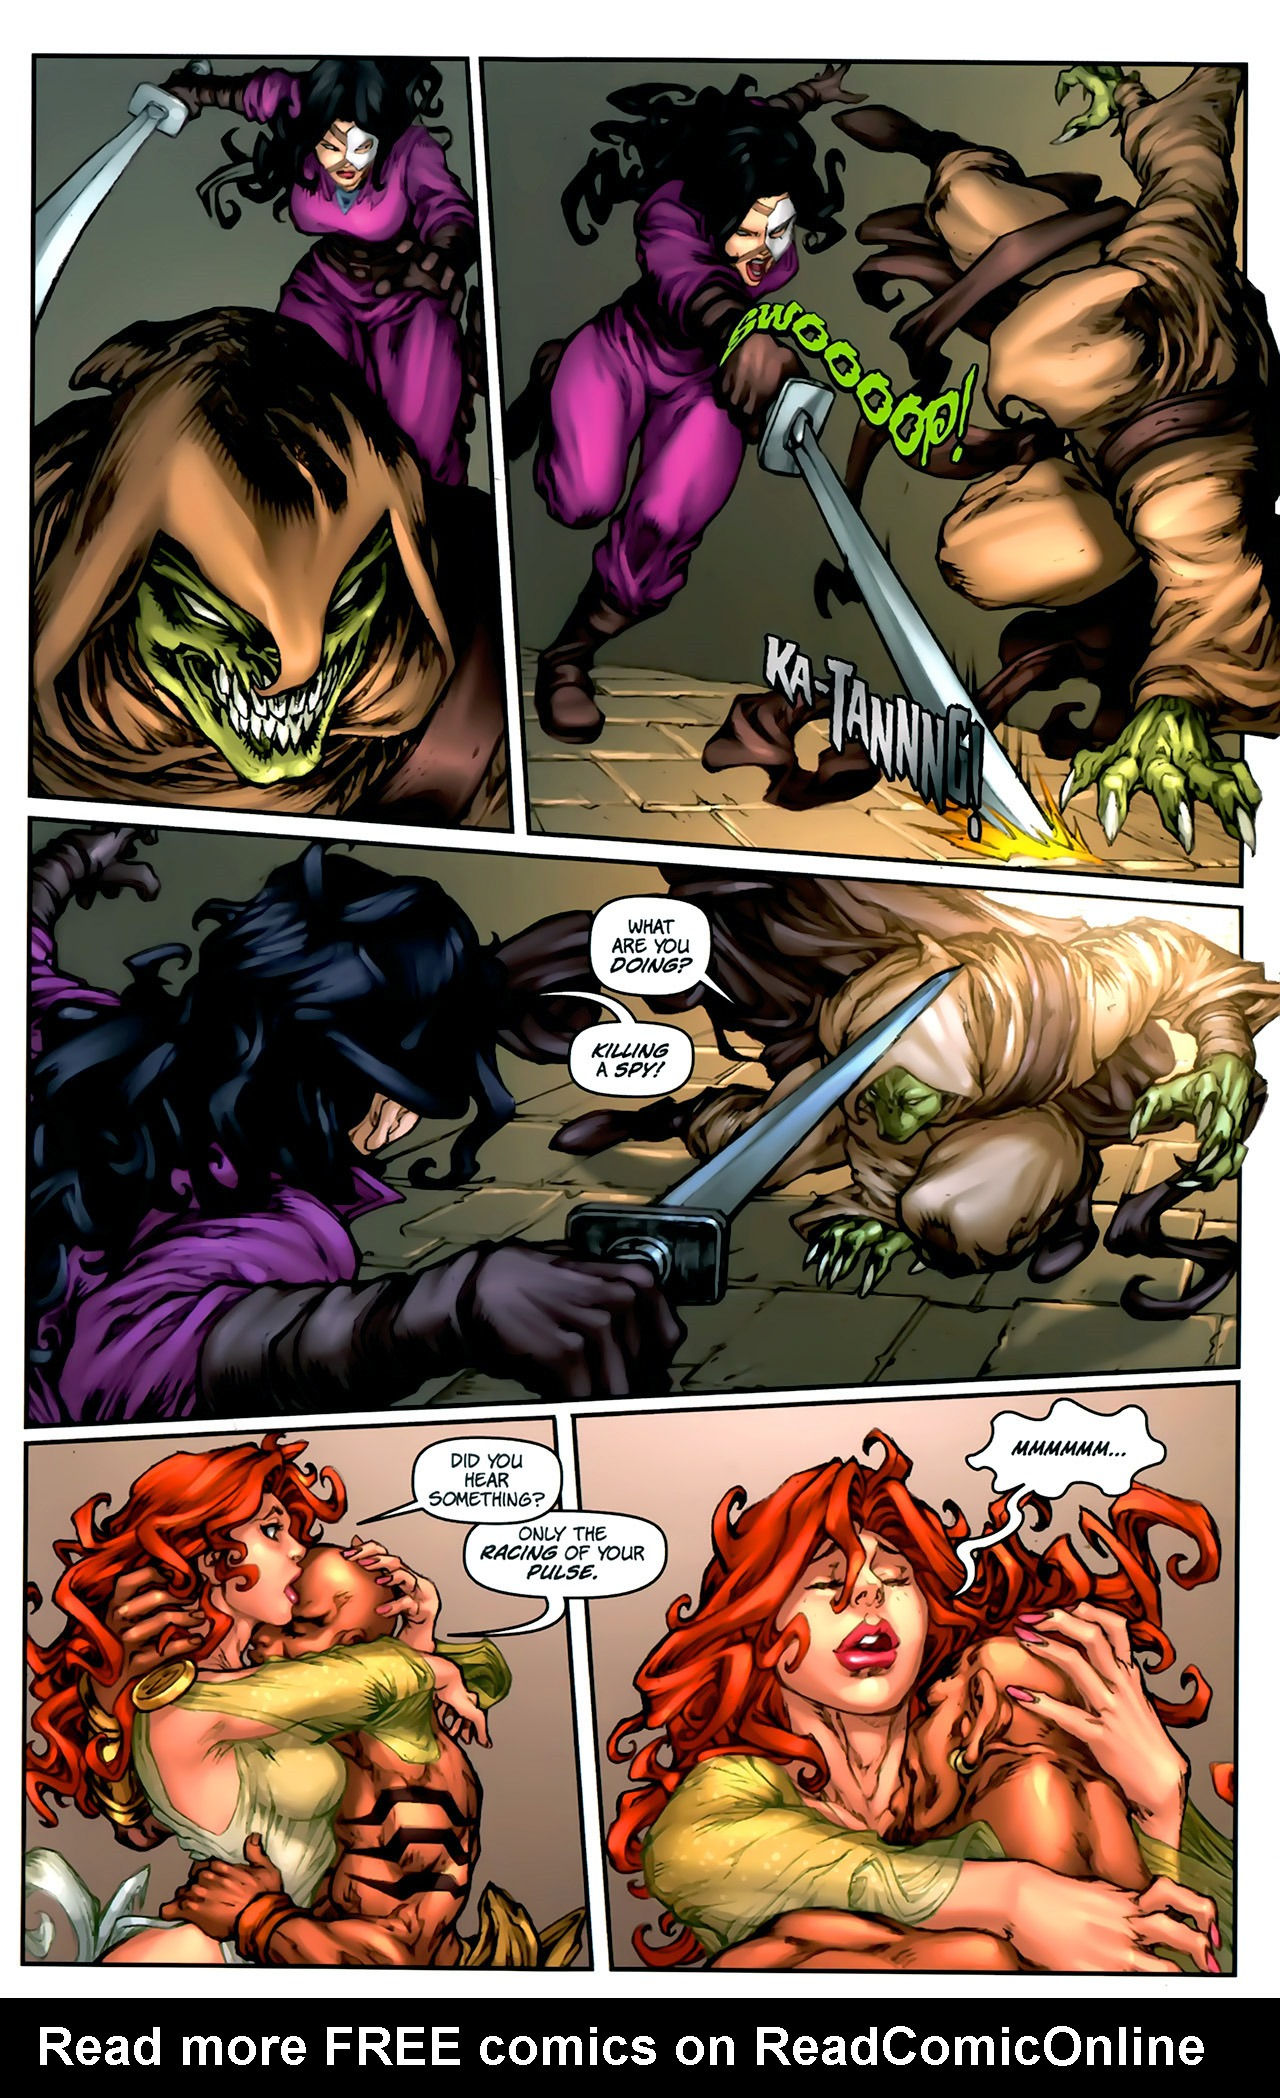 Read online 1001 Arabian Nights: The Adventures of Sinbad comic -  Issue #2 - 9